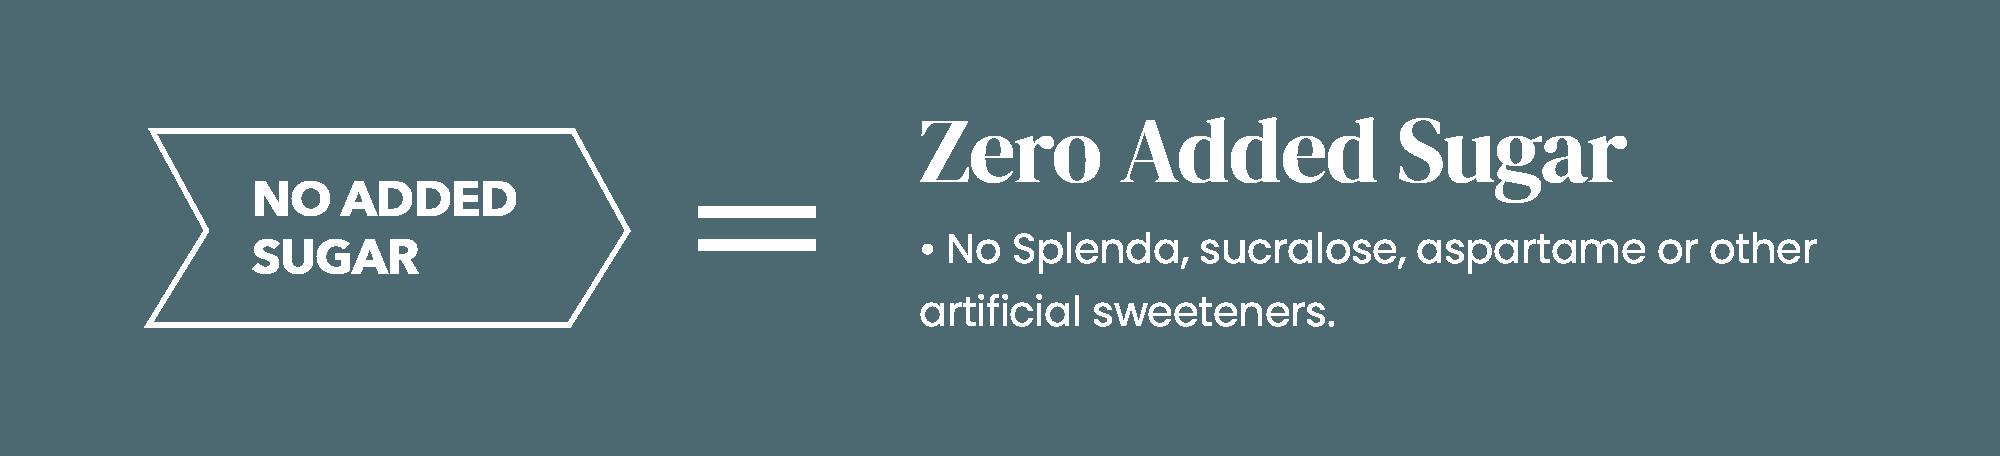 Halo Healthy Tribes No Added Sugar